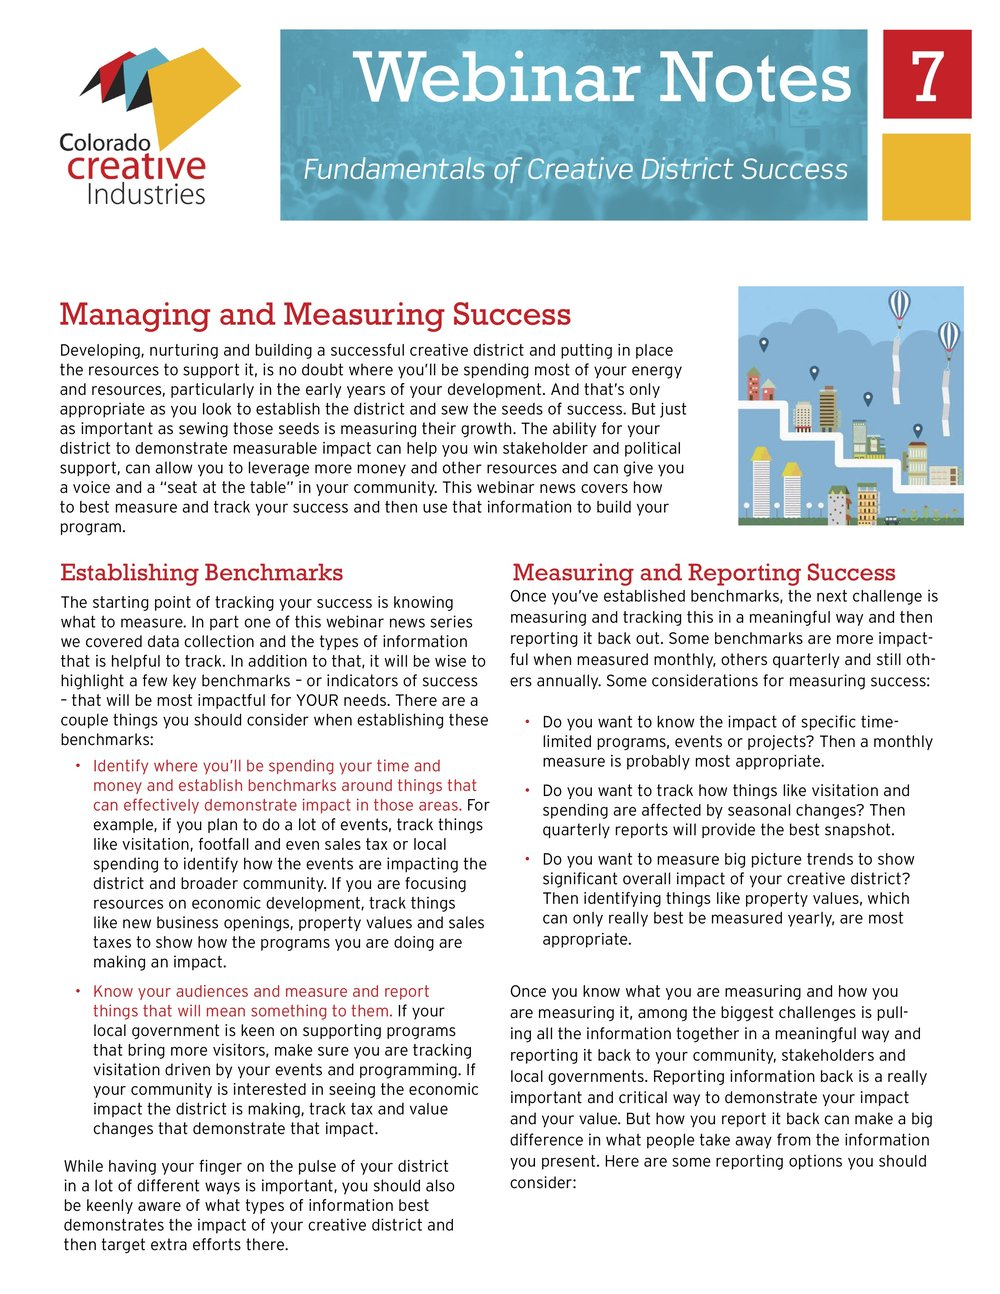 Managing and Measuring Success -